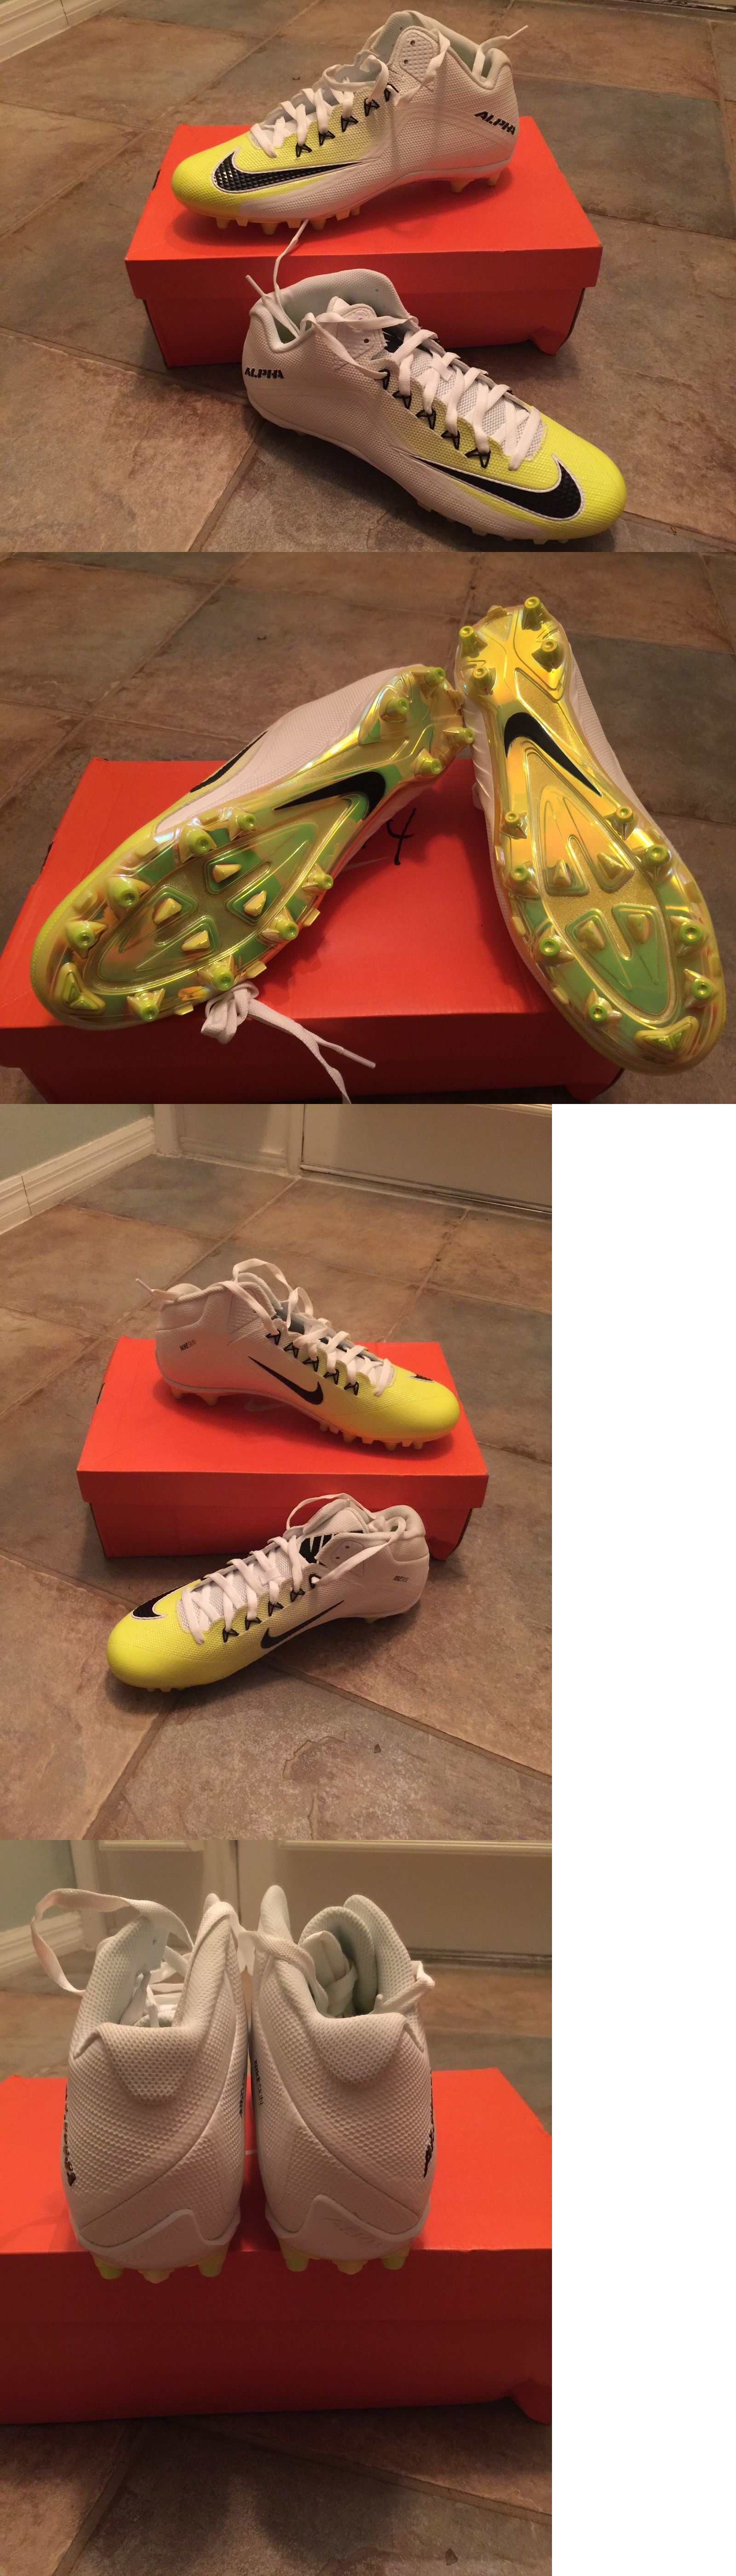 Men 159116: Rare 2017 Nfl Pro Bowl Issue Nike Alpha Pro 2 3 4 Td